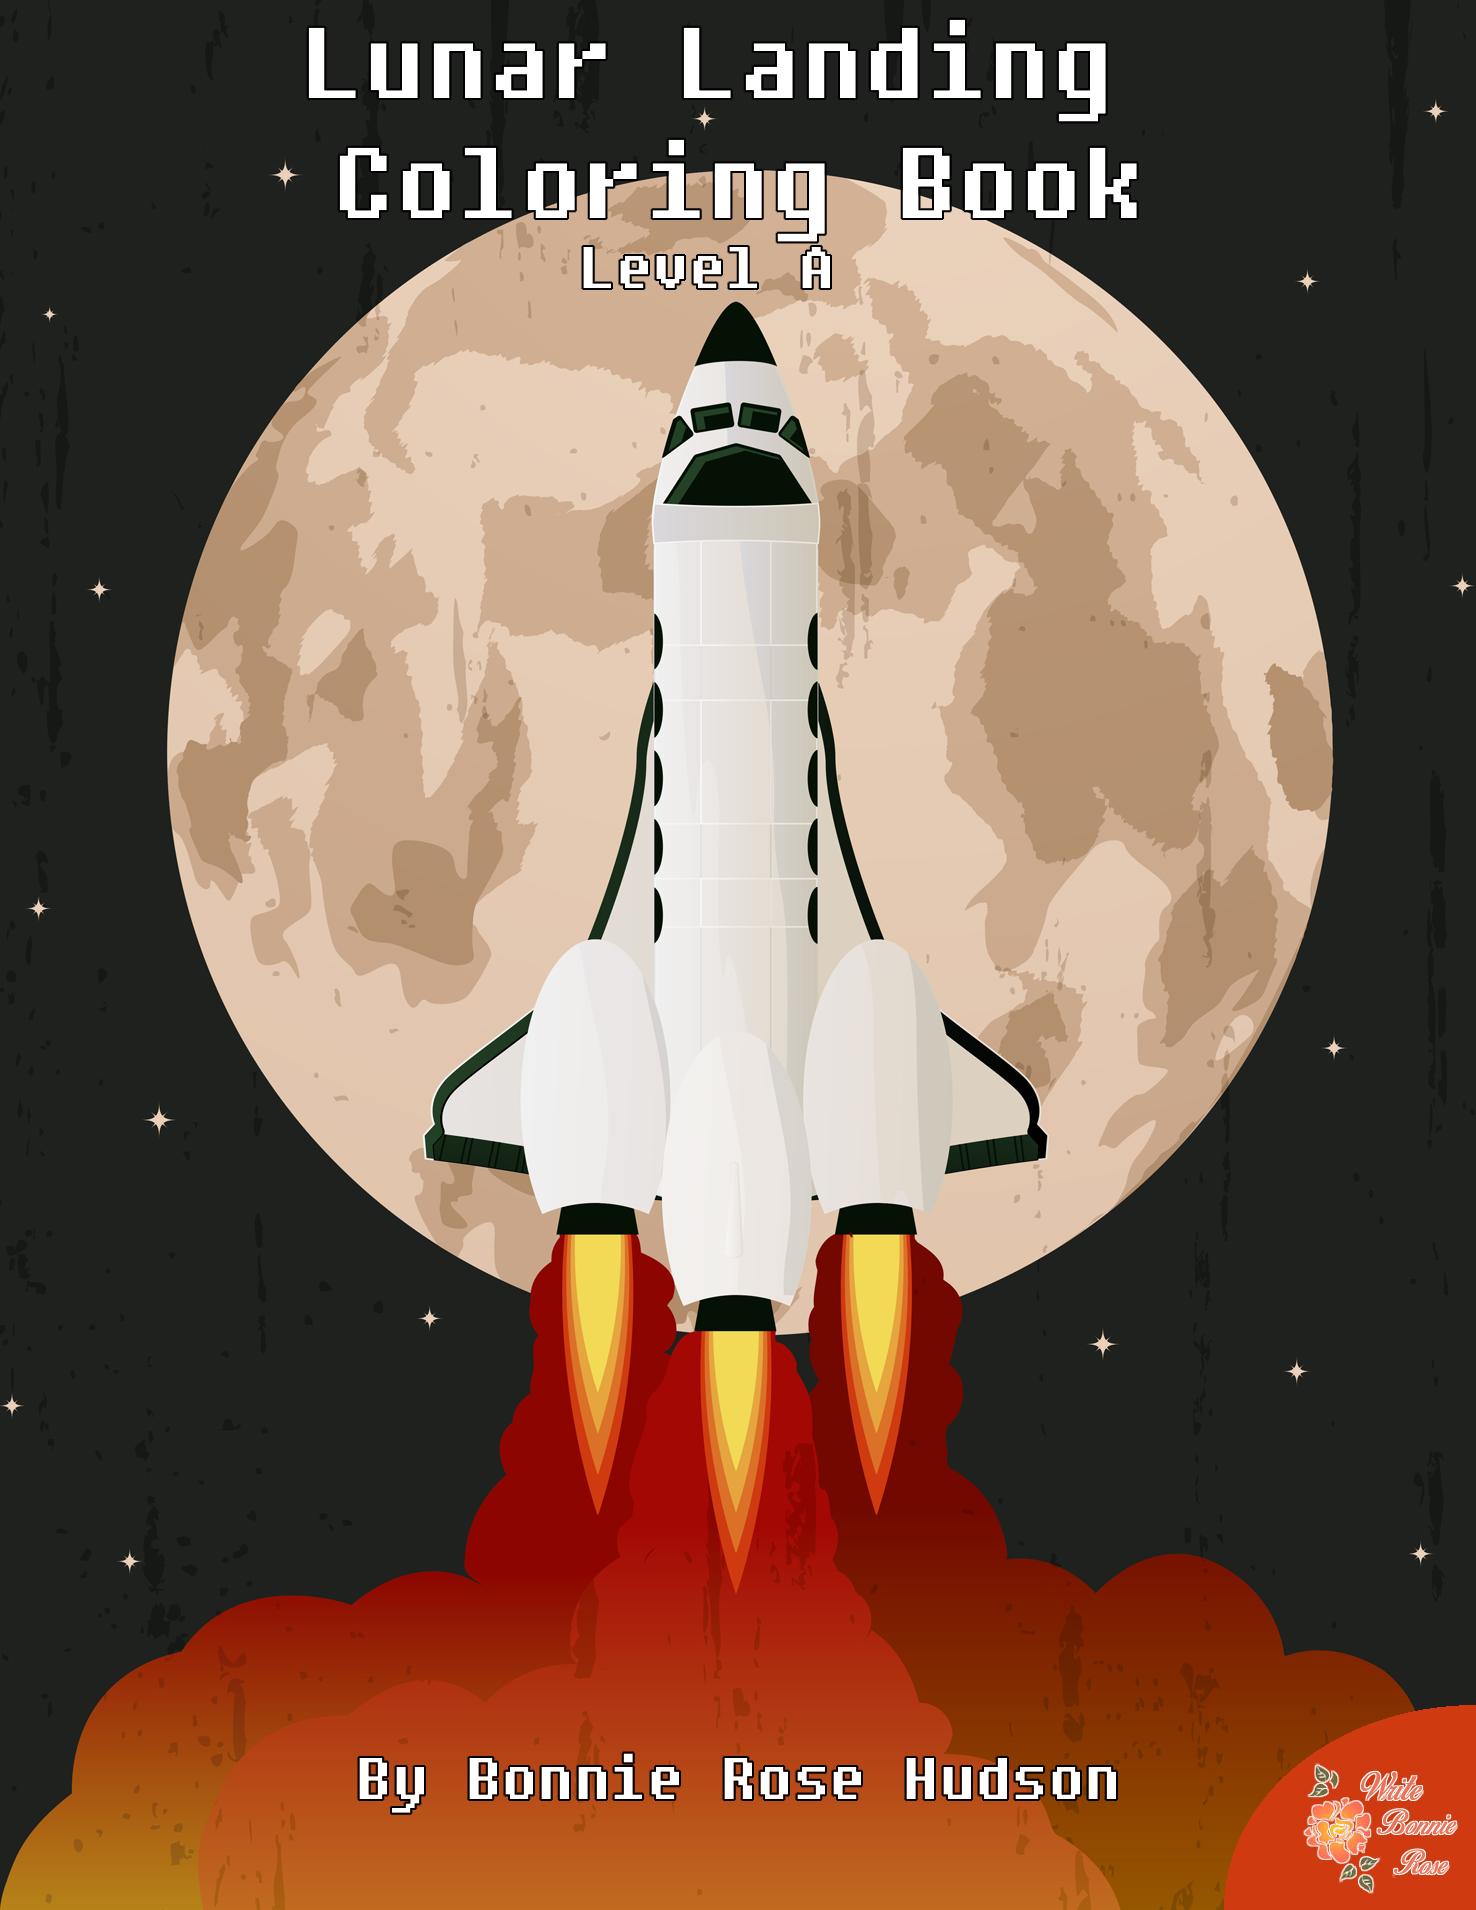 moon landing color - photo #22